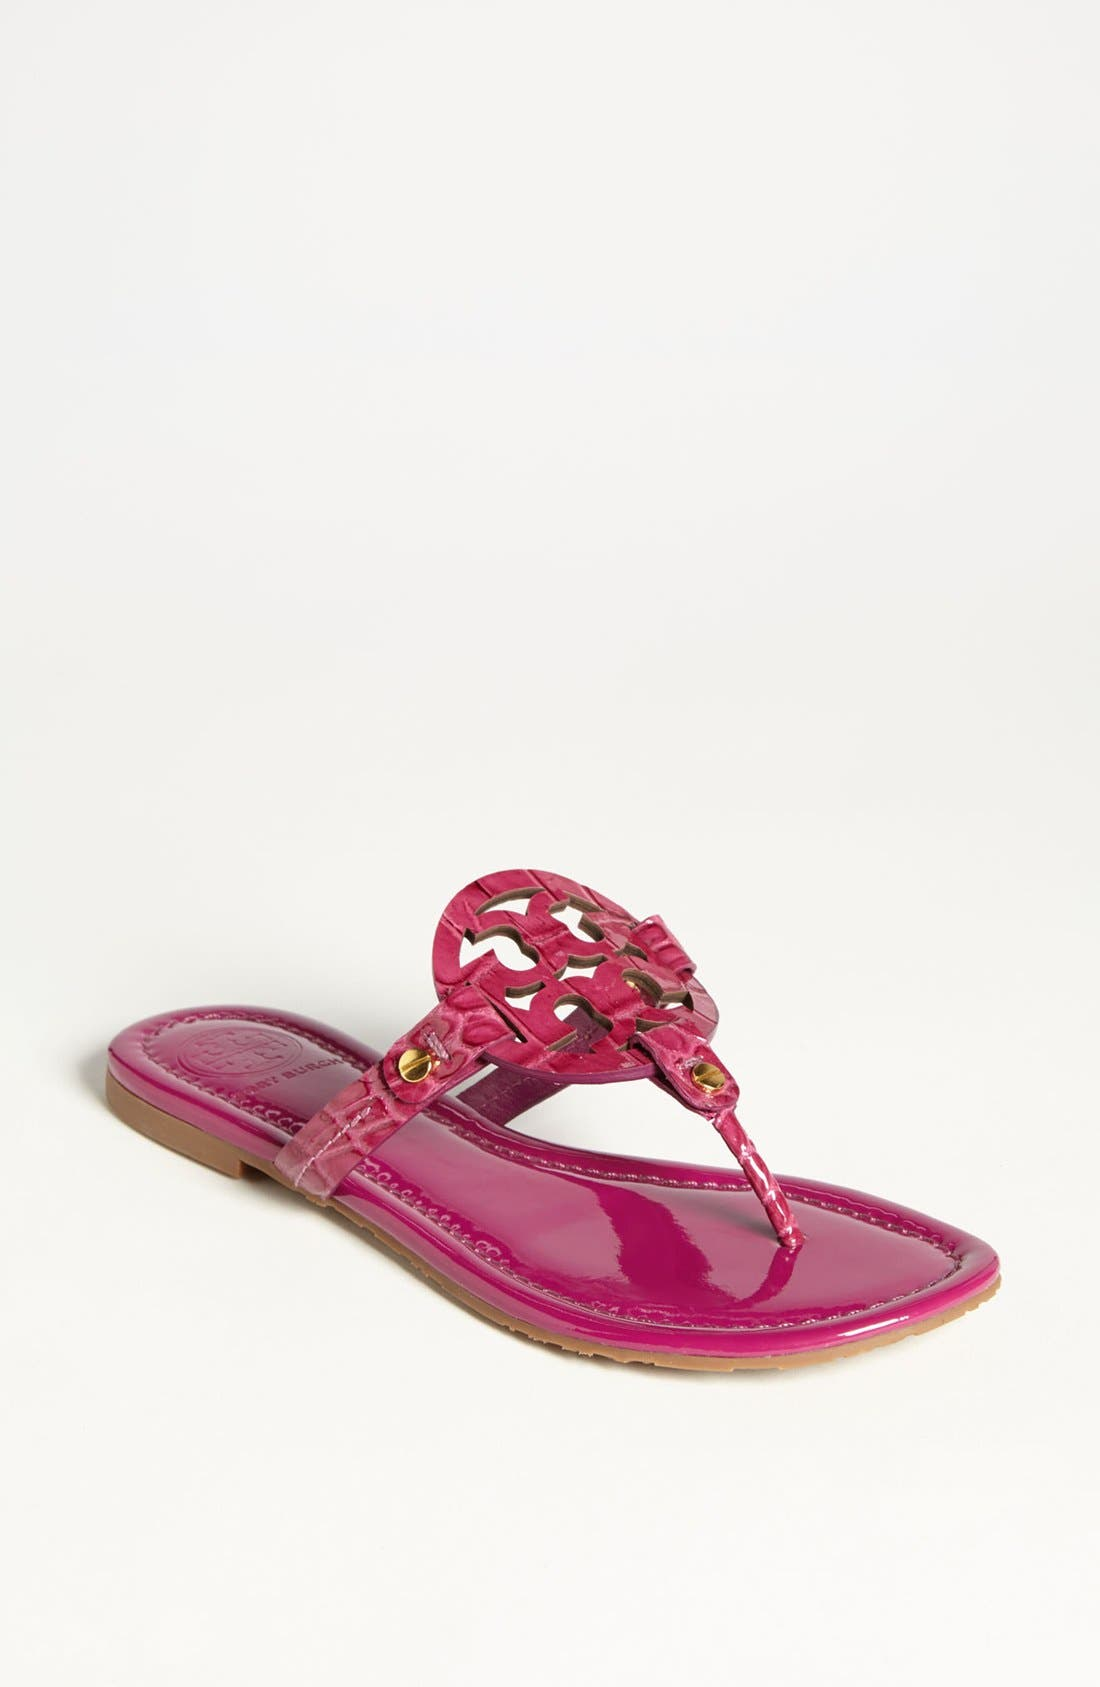 Alternate Image 1 Selected - Tory Burch 'Miller' Croc Embossed Sandal (Online Only)